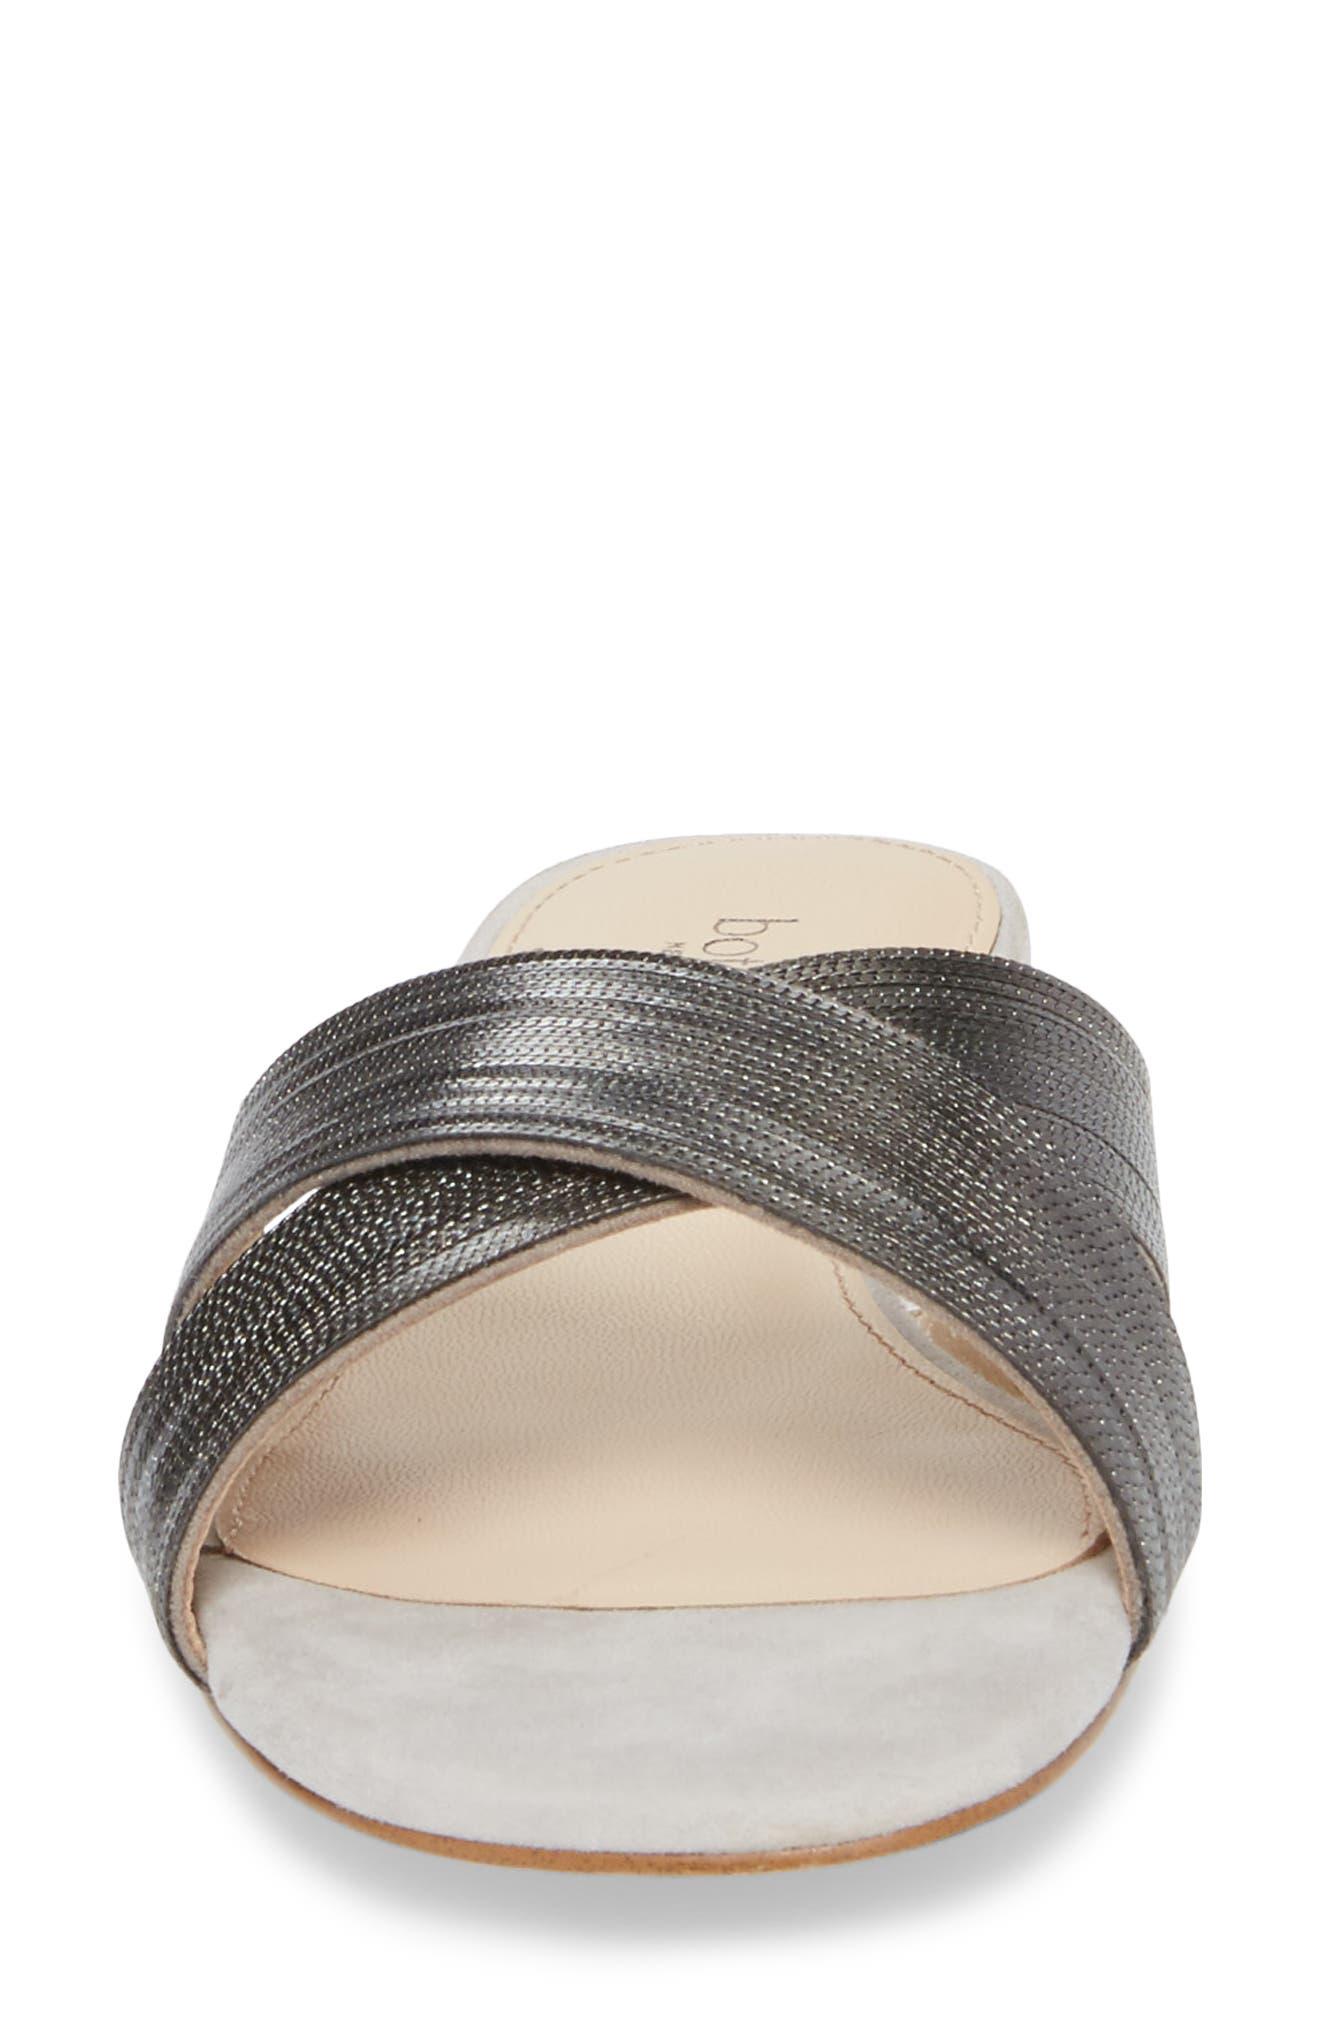 Millie Cross Strap Slide Sandal,                             Alternate thumbnail 4, color,                             Clay/ Gunmetal Suede